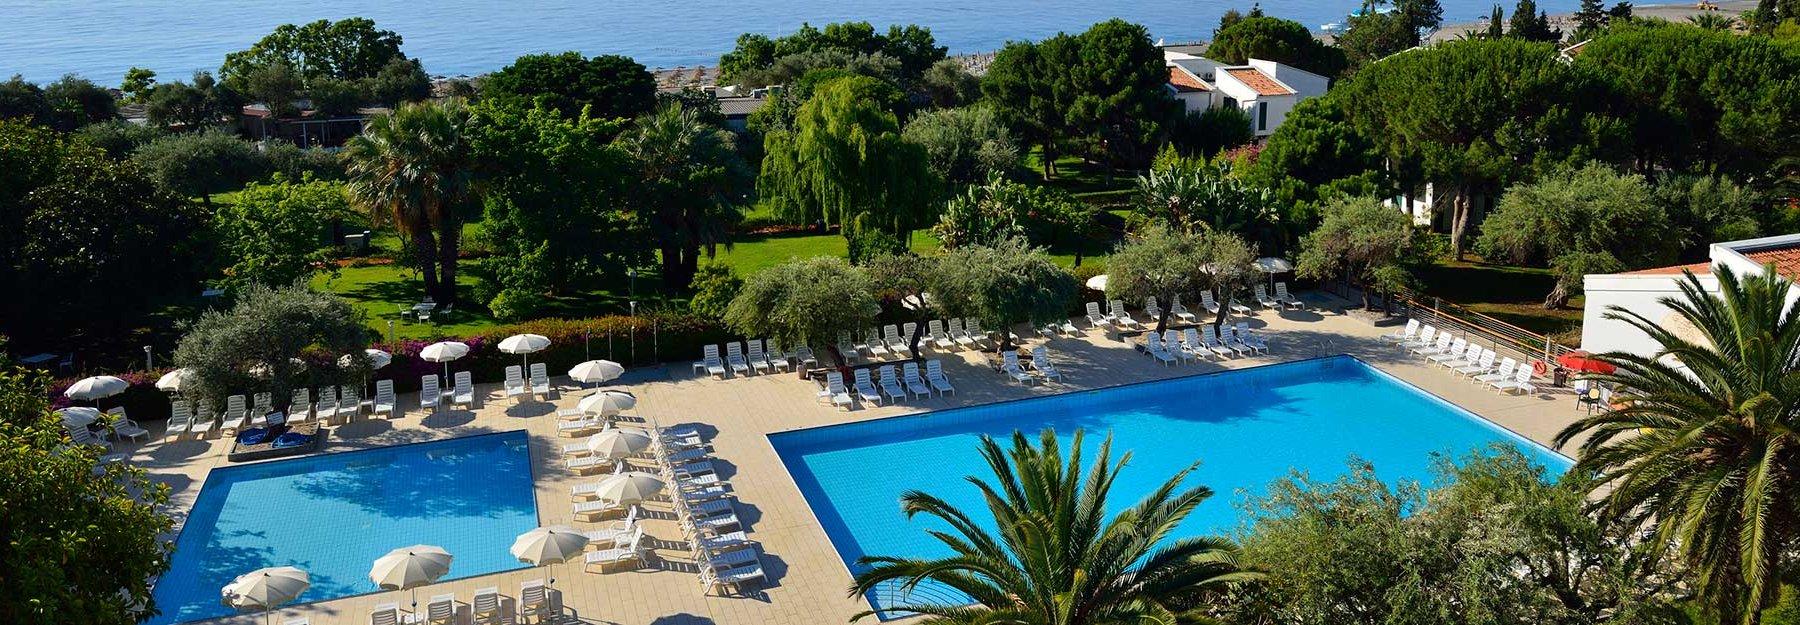 giardini naxos unahotels naxos beach sicilia